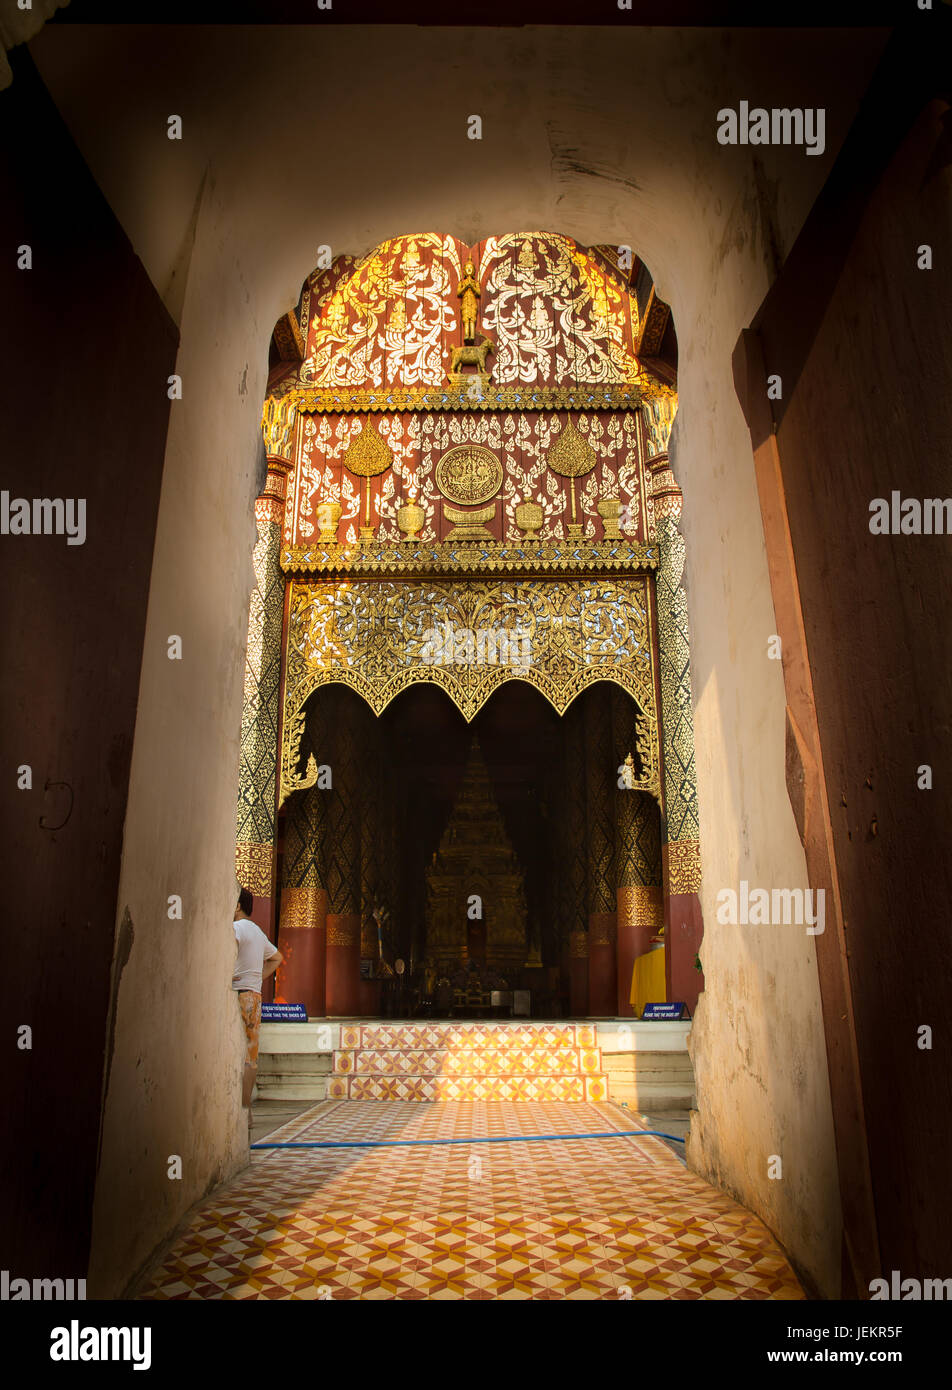 Entrance of Wat Phra That Lampang Luang. Lanna style temple - Stock Image